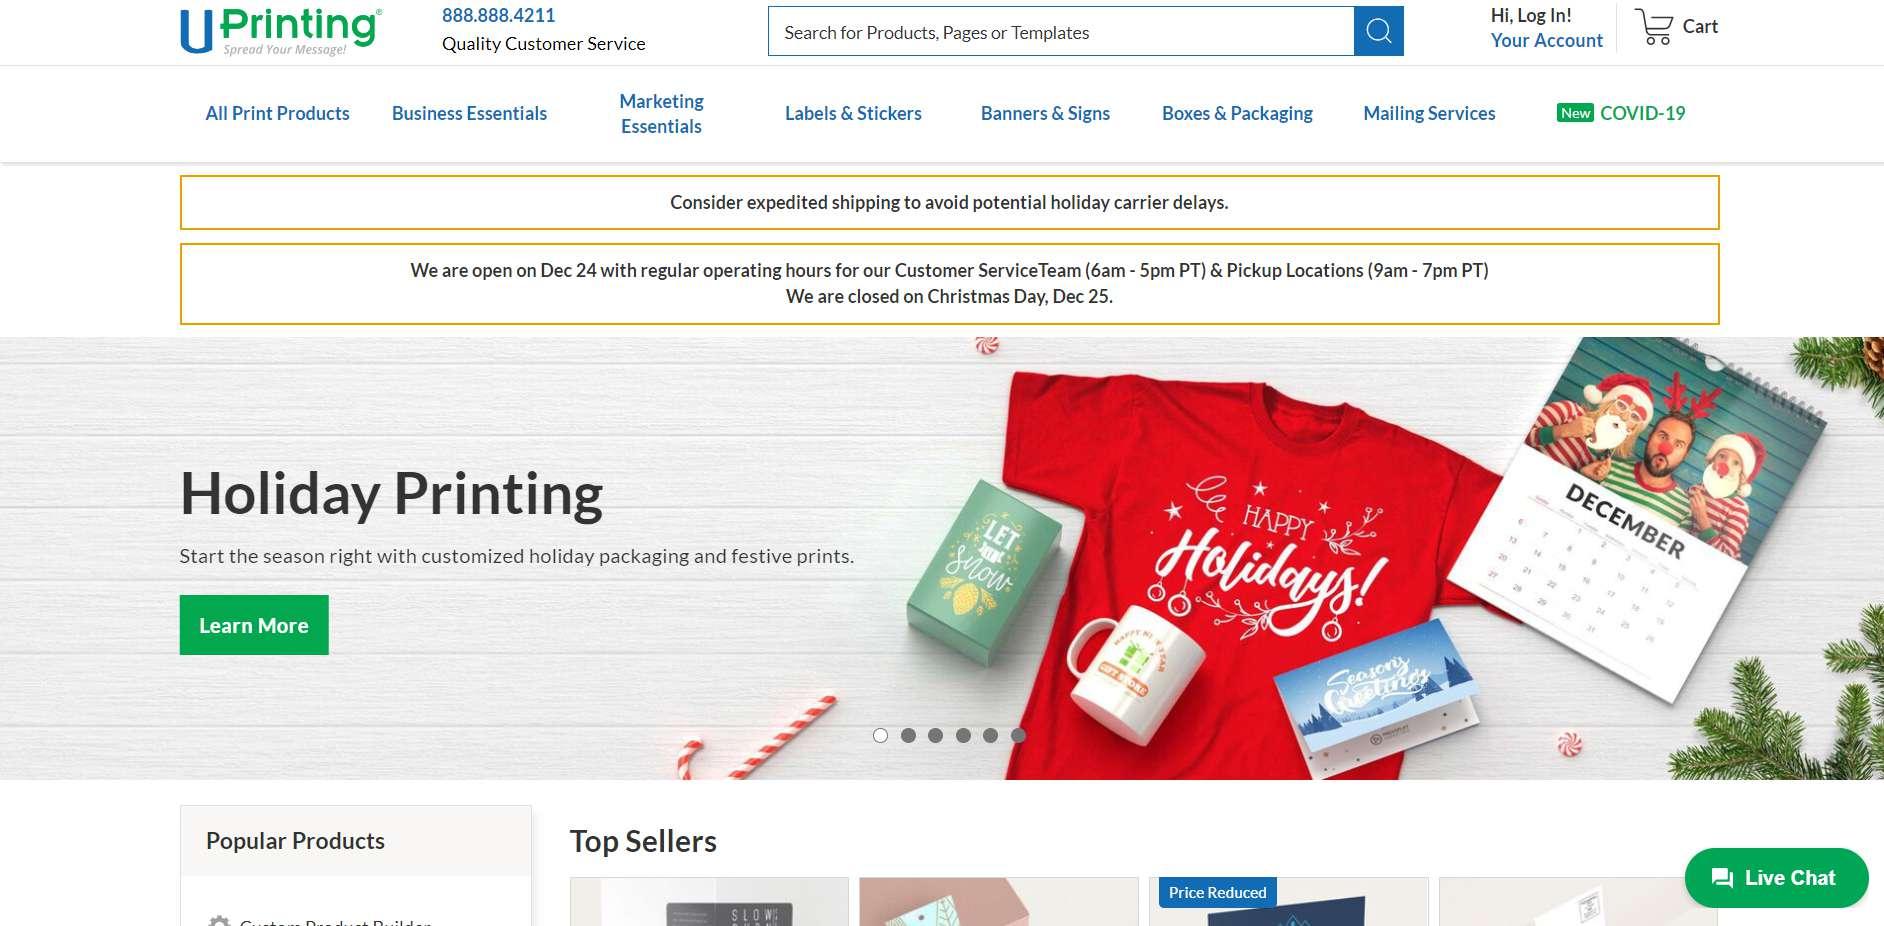 The UPrinting homepage